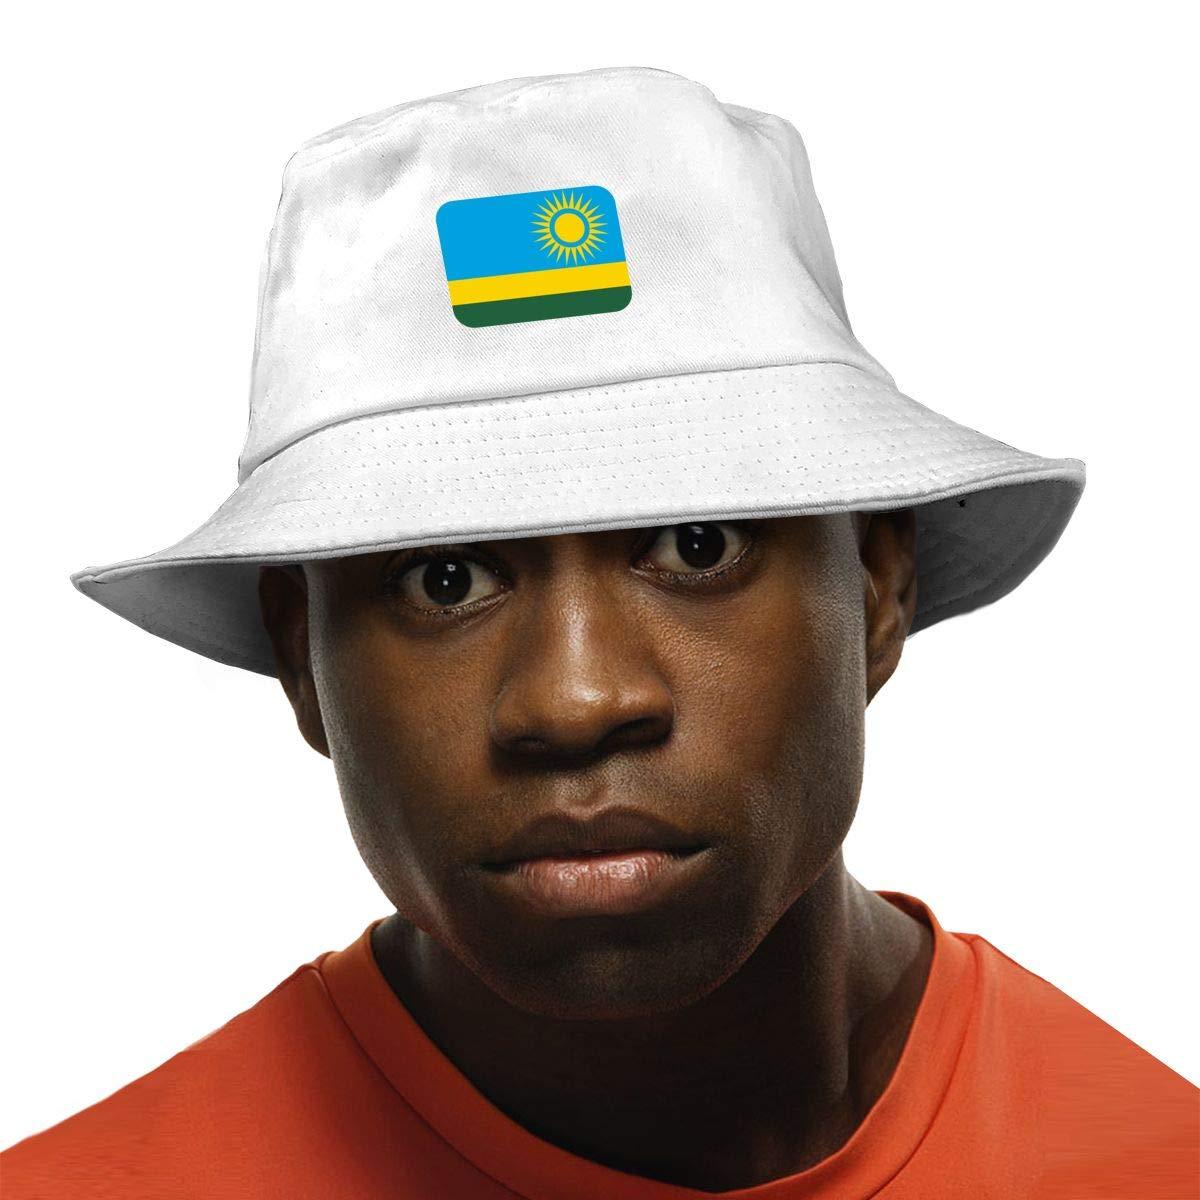 NDFGR Rwanda Unisex Cotton Packable Black Travel Bucket Hat Fishing Cap